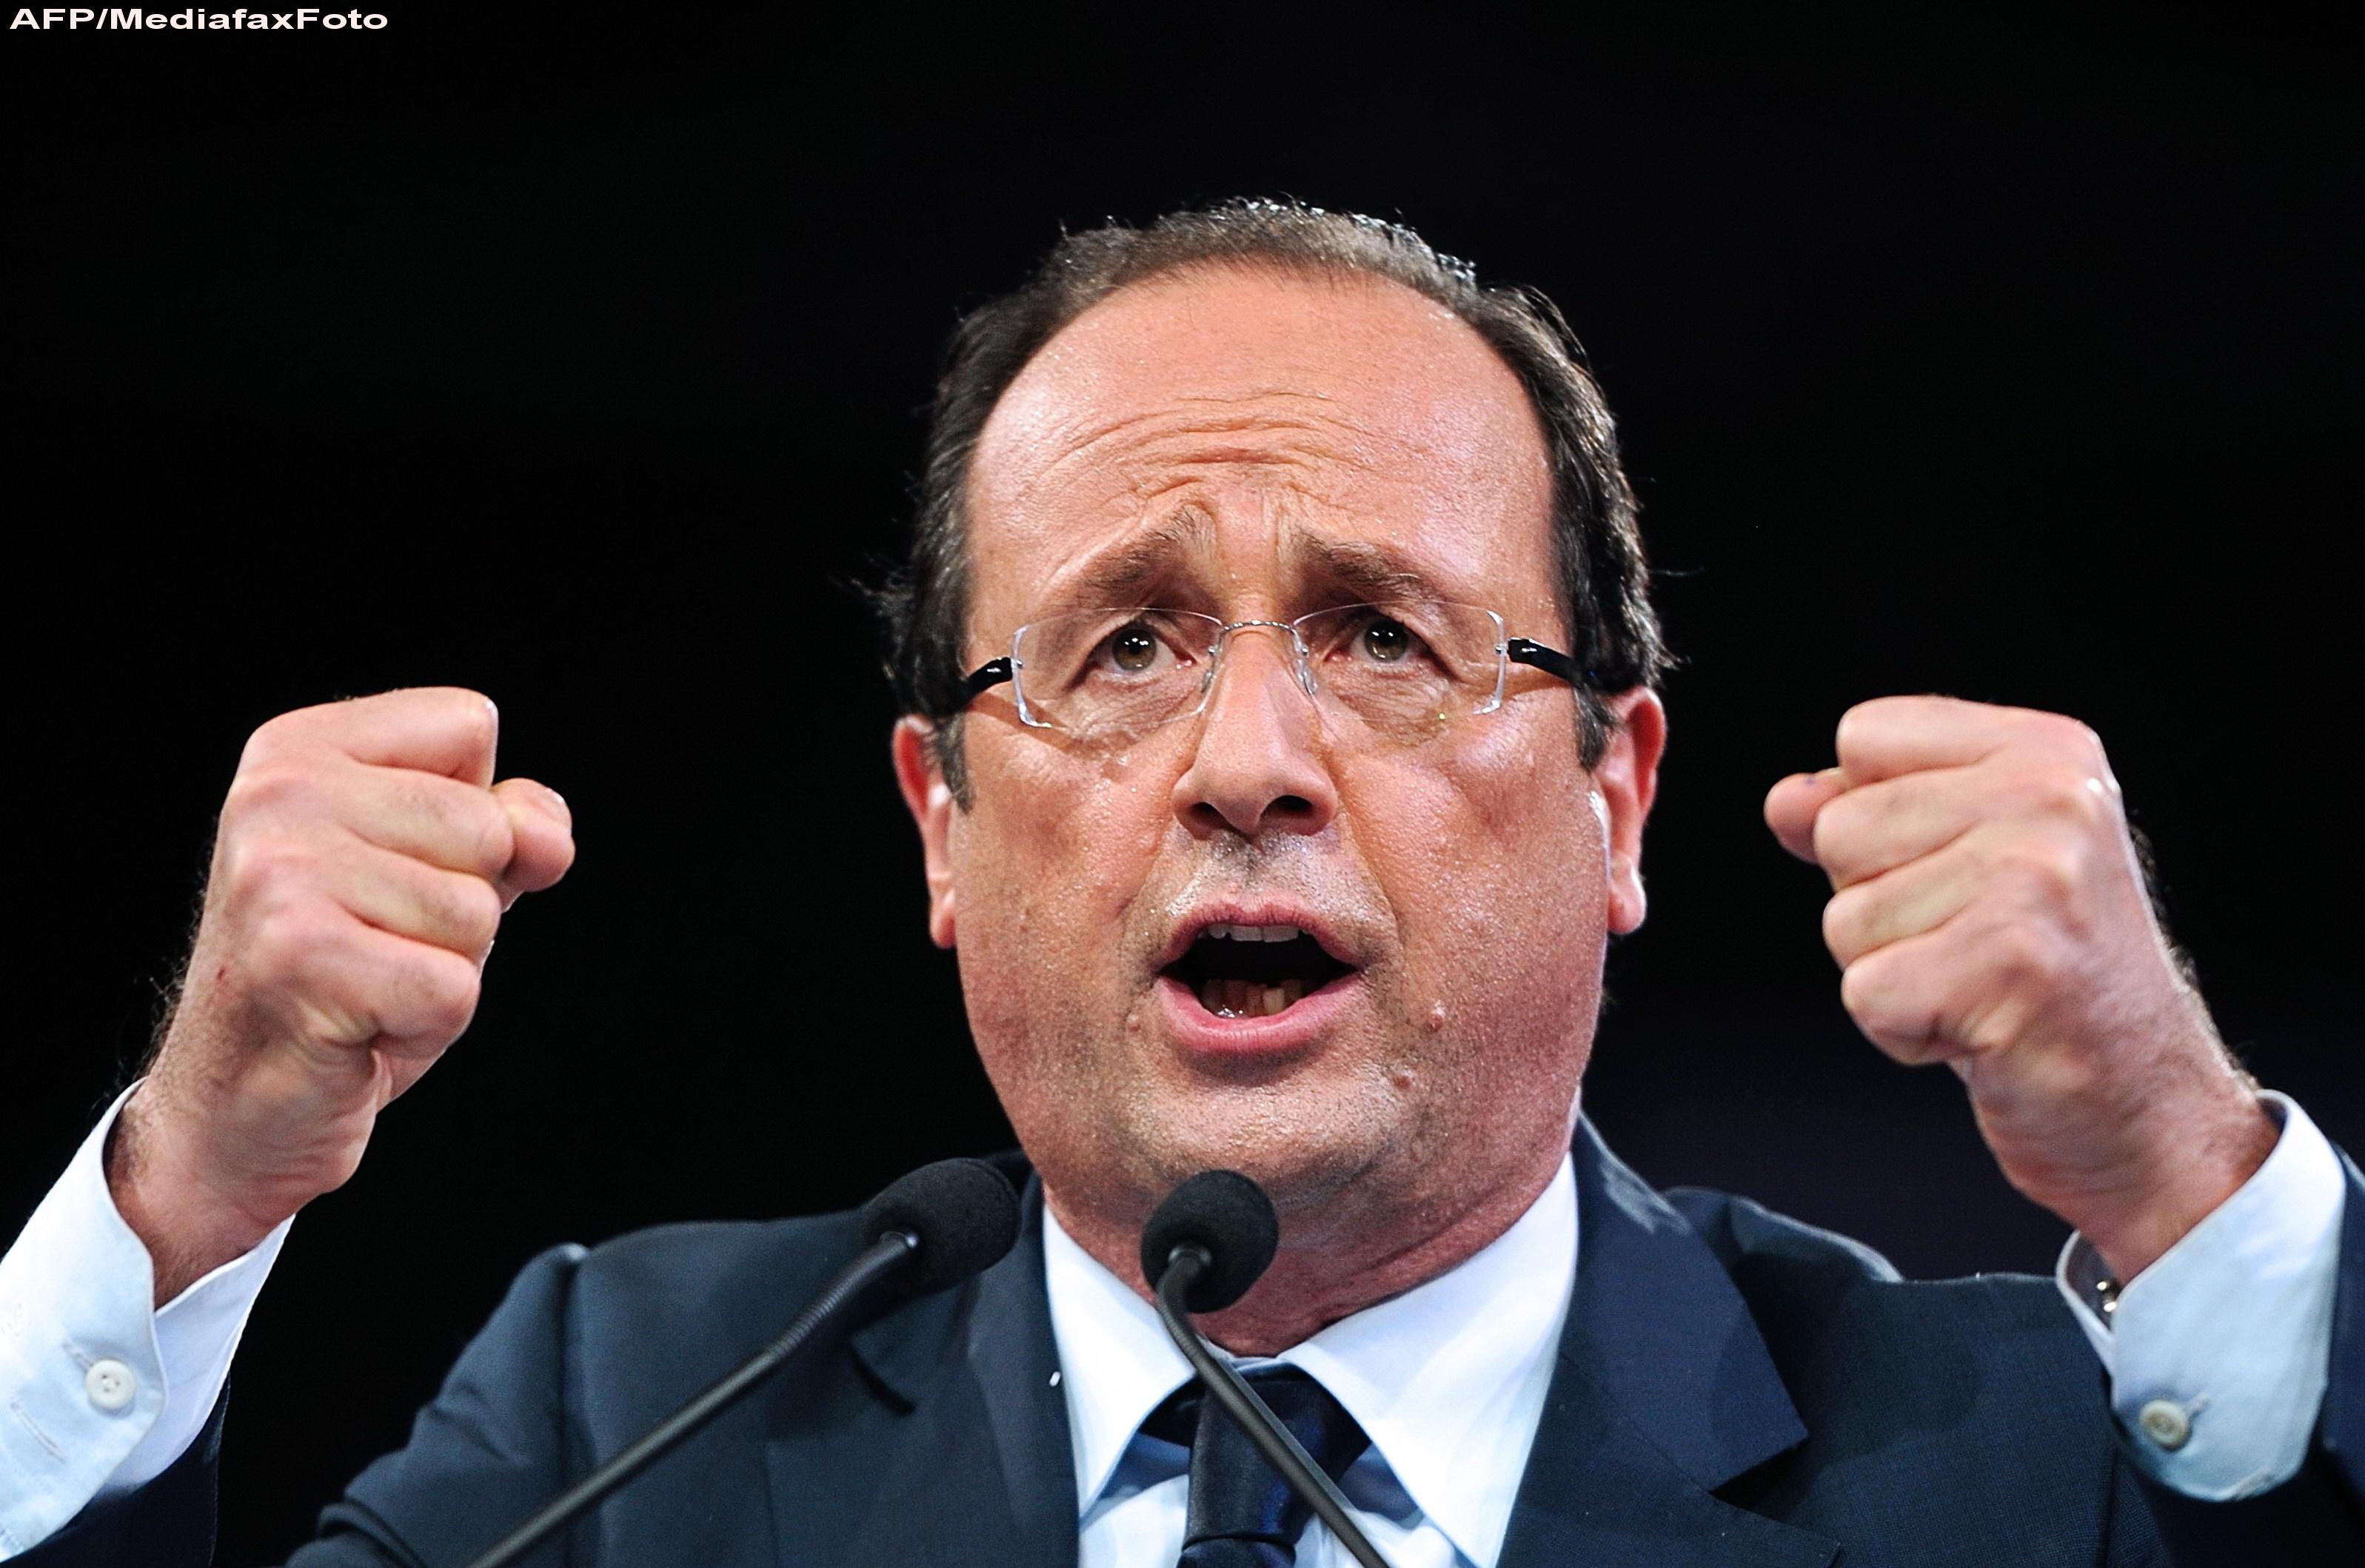 Alegeri in Franta. Cine e Francois Hollande, omul care l-a invins pe Nicolas Sarkozy